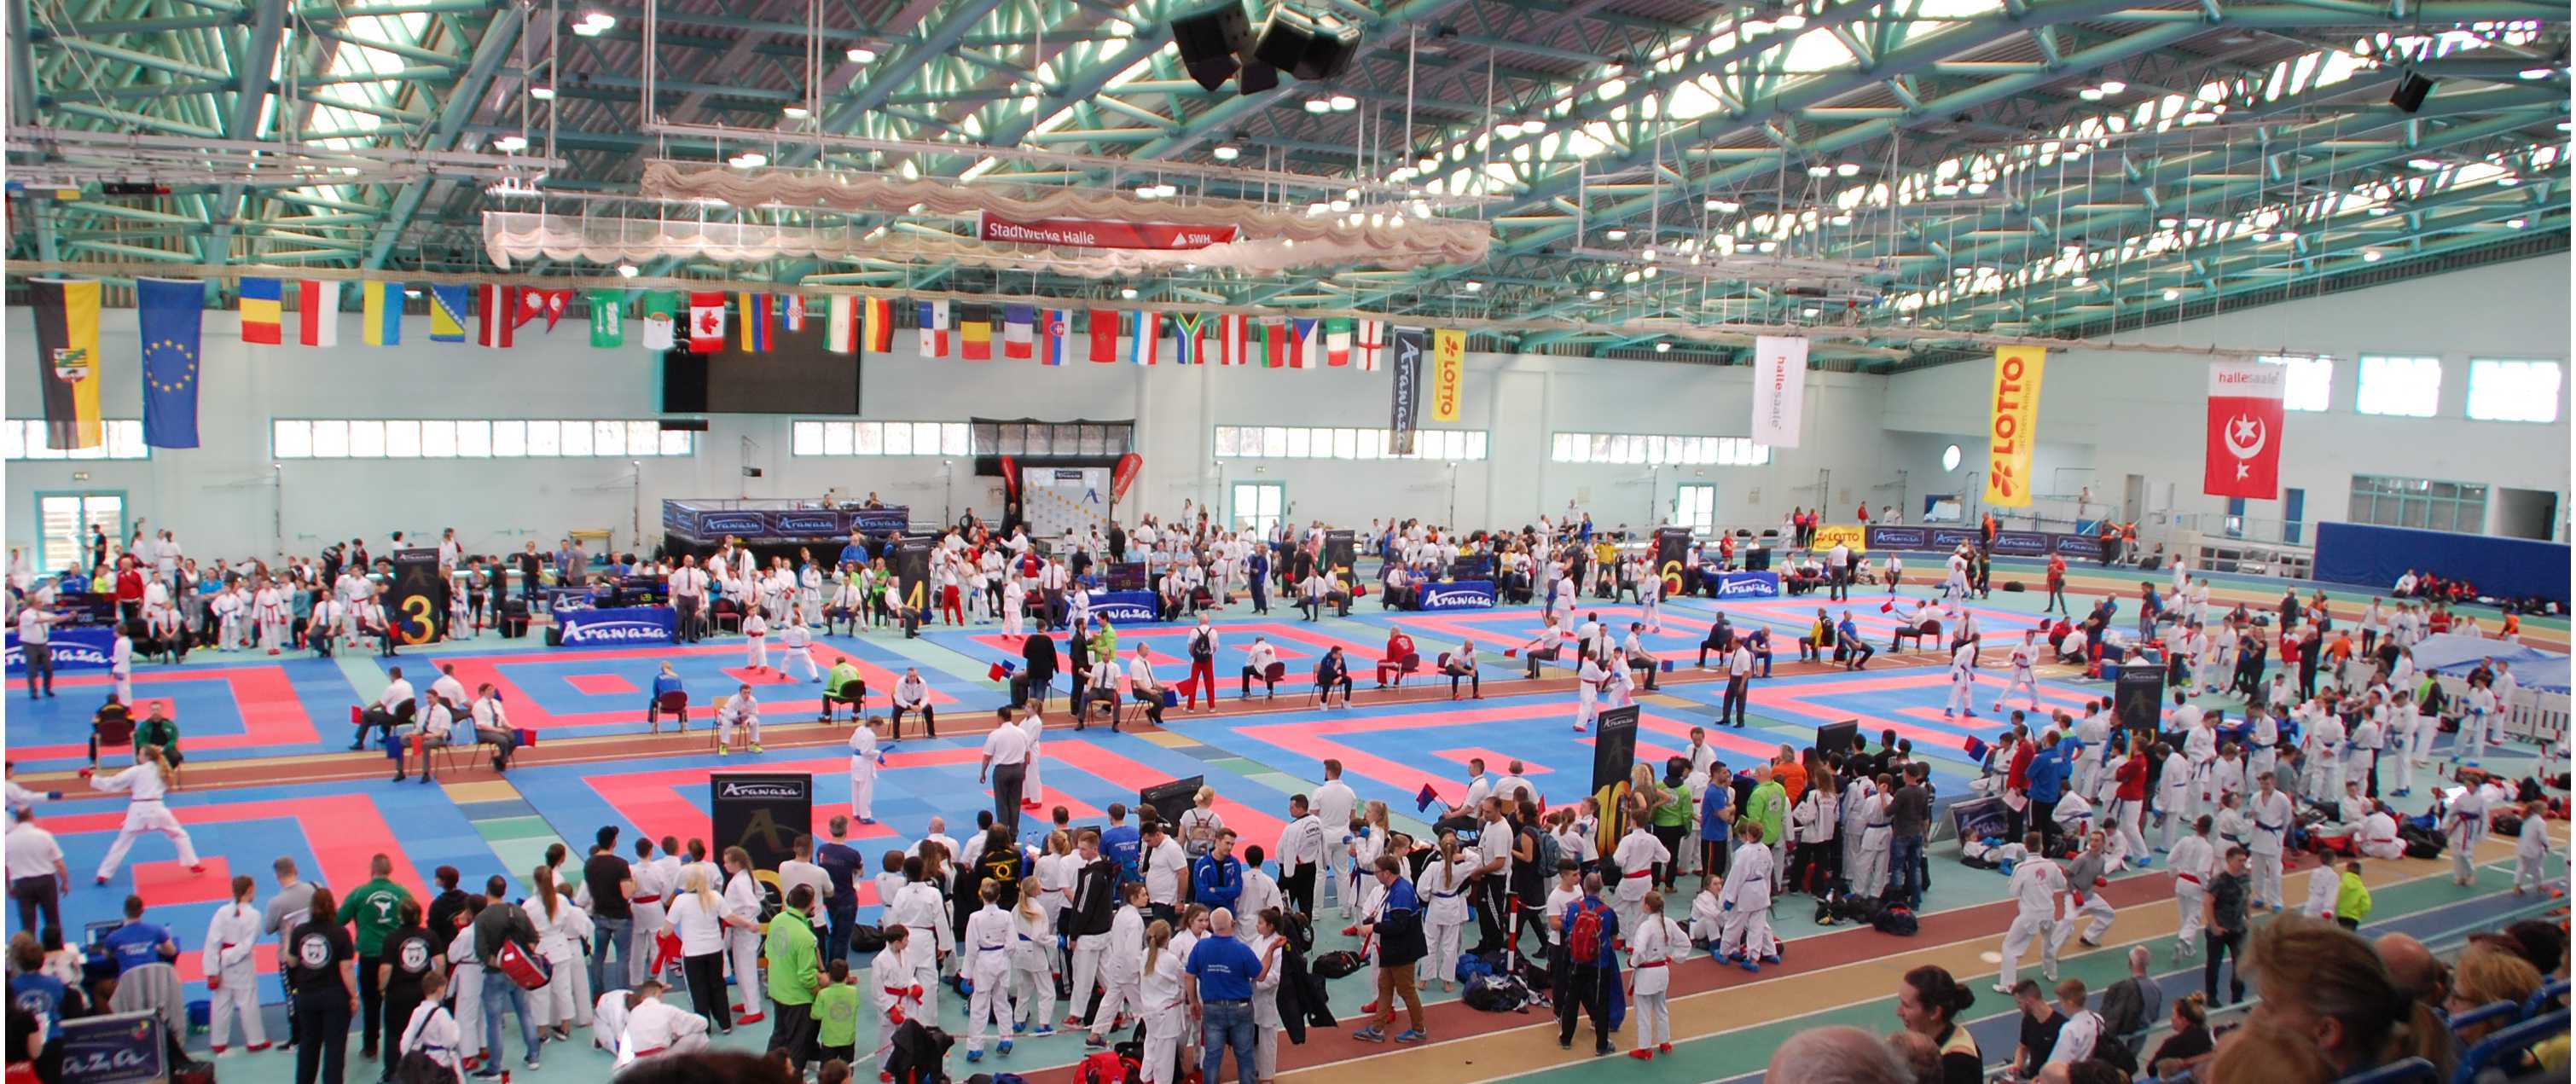 01_Sporthalle